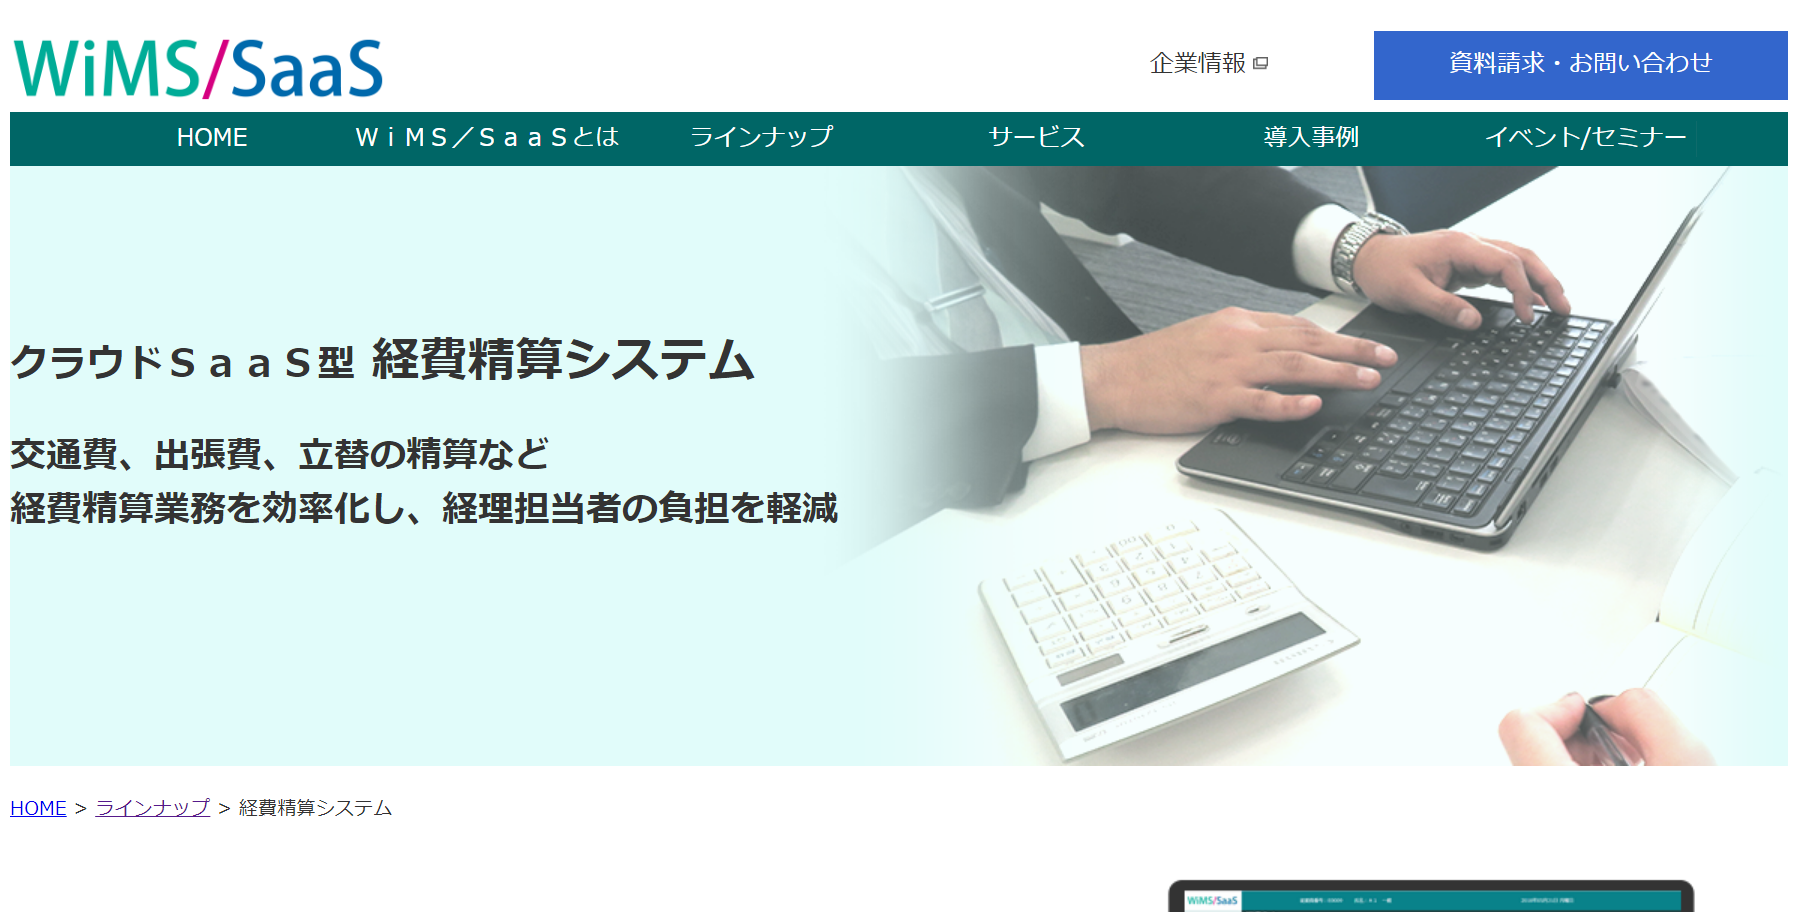 WiMS/SaaS 経費精算システム